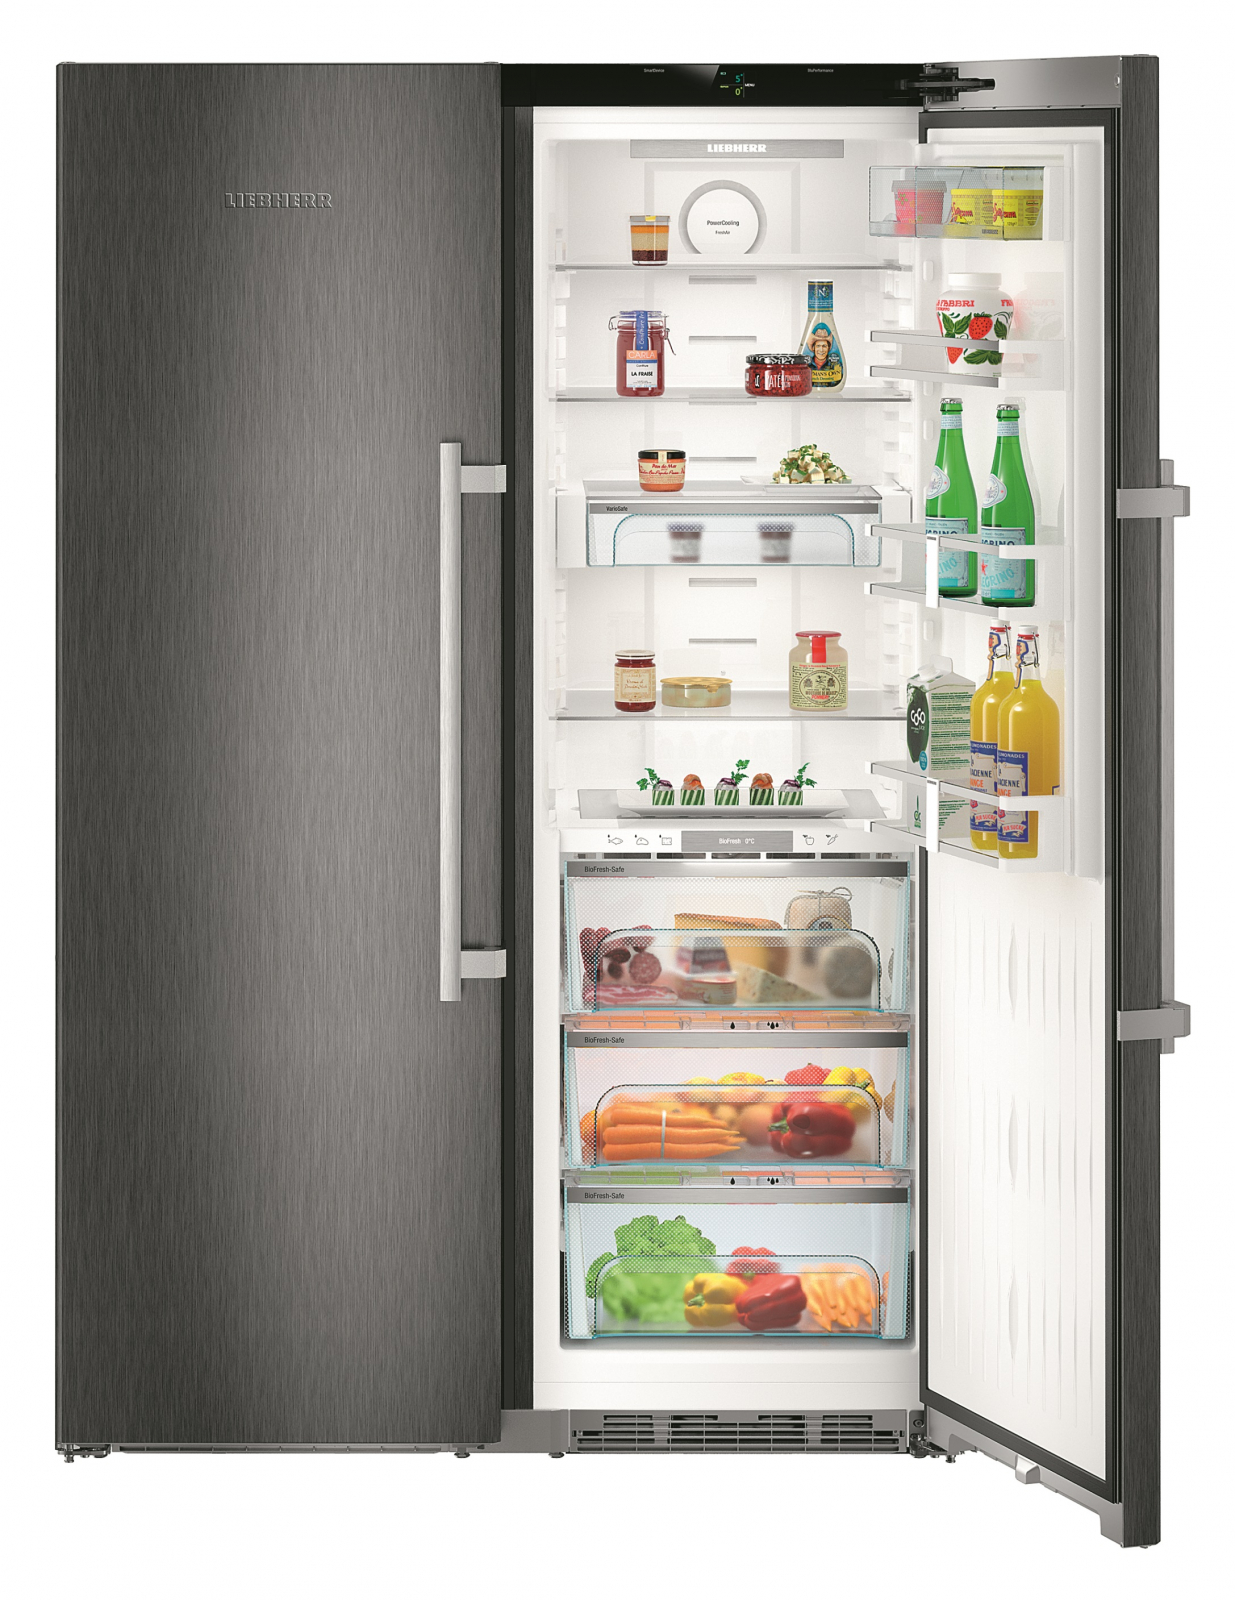 купить Side-by-Side холодильник Liebherr SBSbs 8673 Украина фото 4